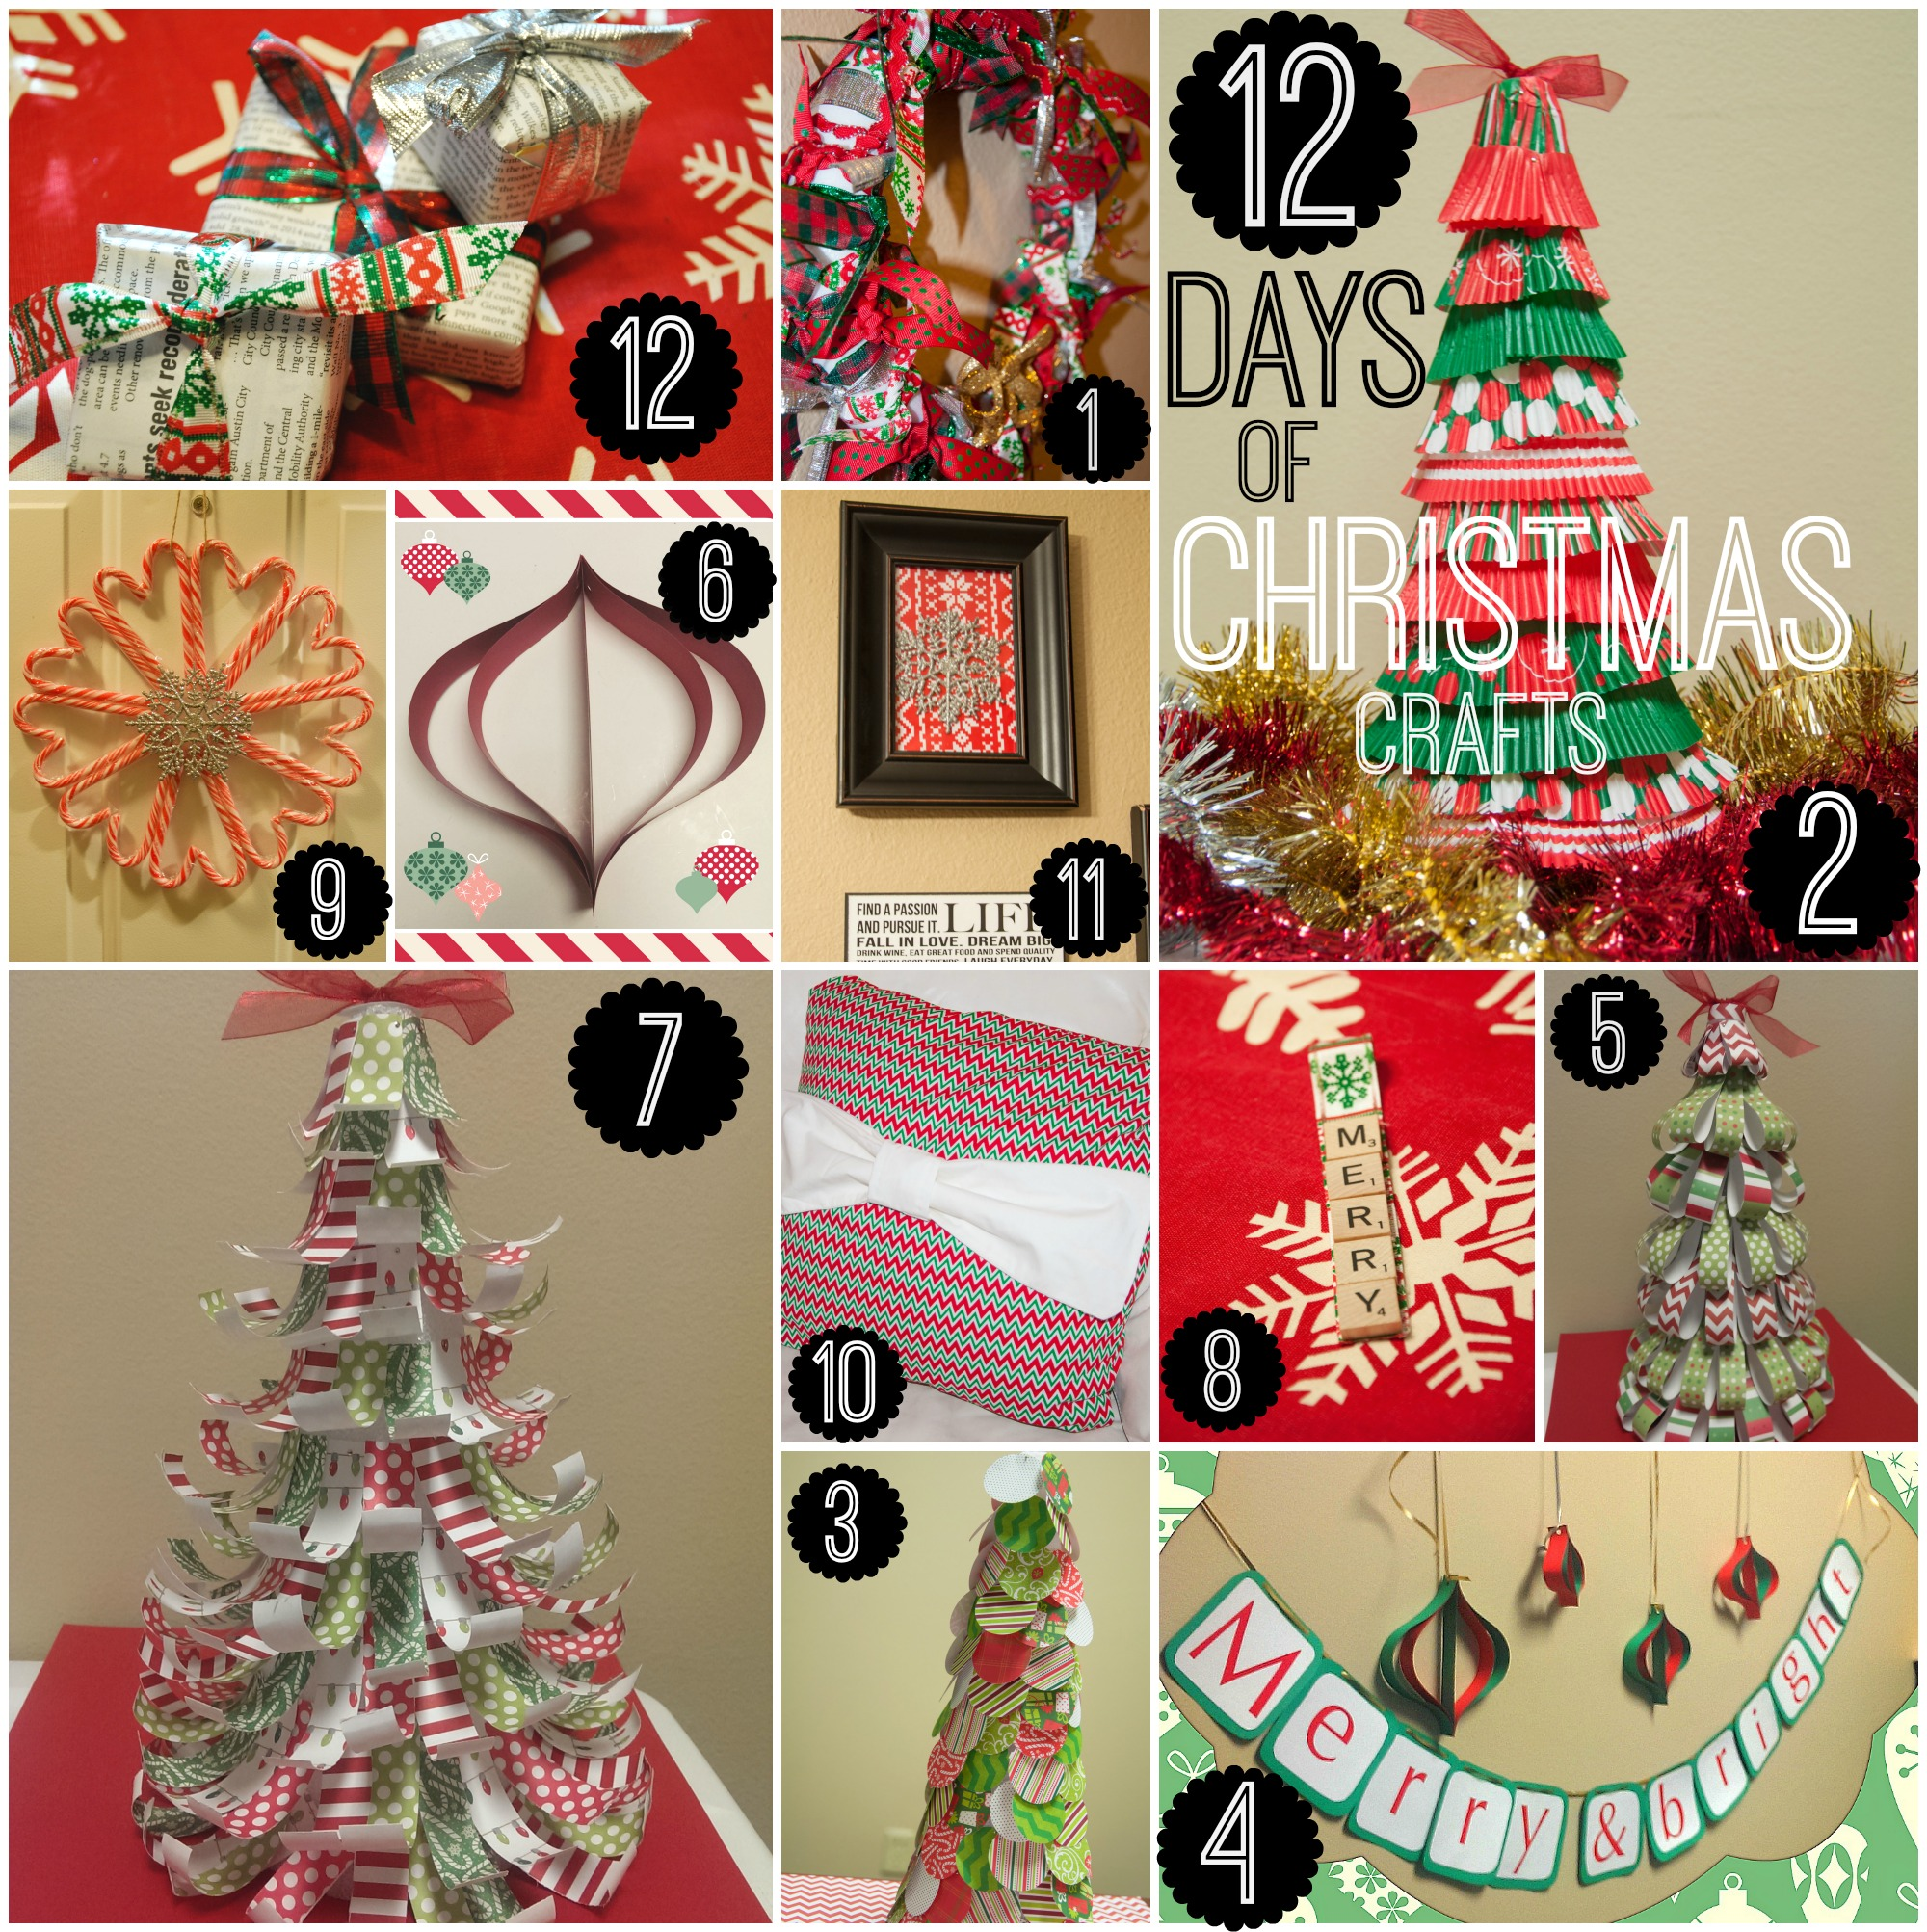 12 Days Of Christmas Craft Ideas Part - 23: Photo Collage Craft Ideas - All 12 Days Christmas Crafts